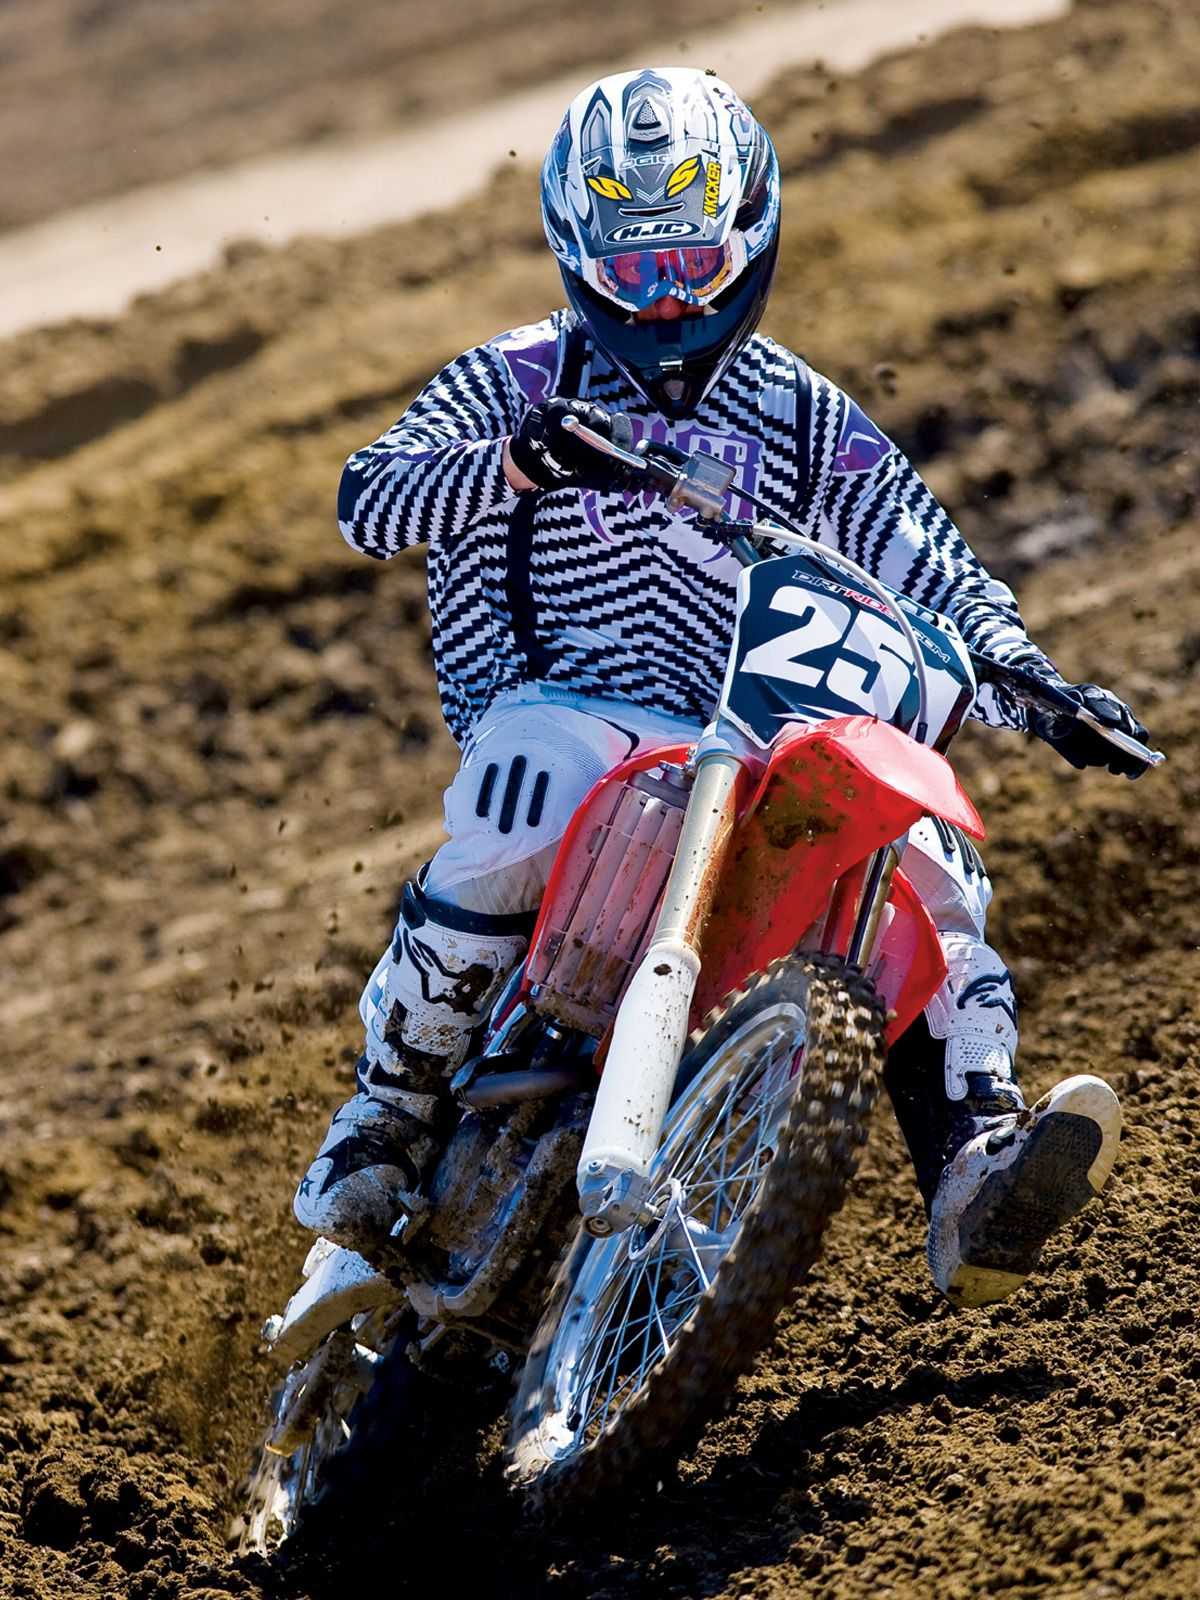 2010 Honda CRF250R - First Test - Dirt Rider Magazine | Dirt